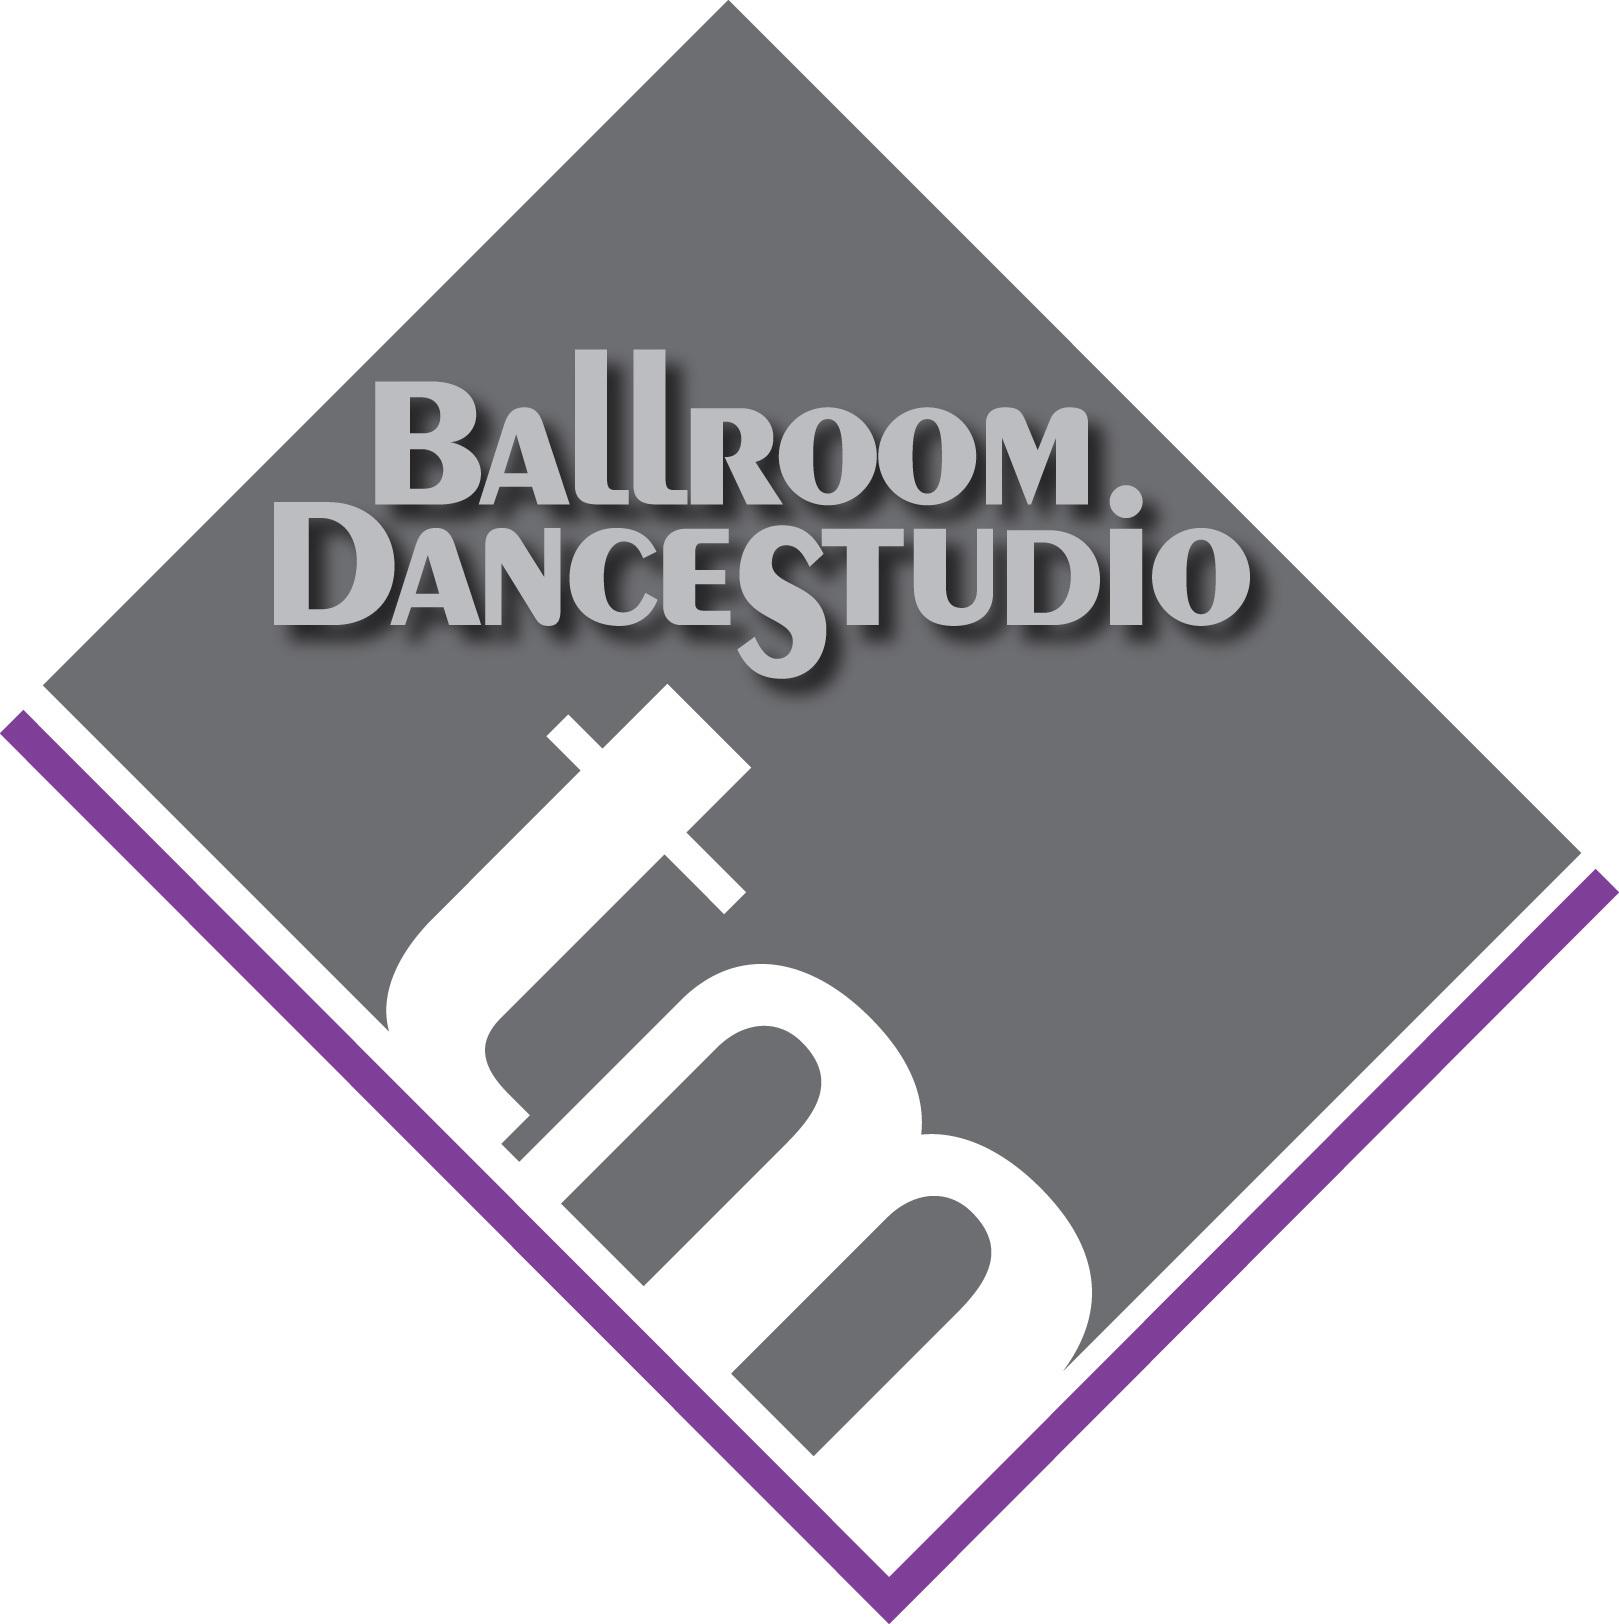 TM_ballroom_logo.jpg